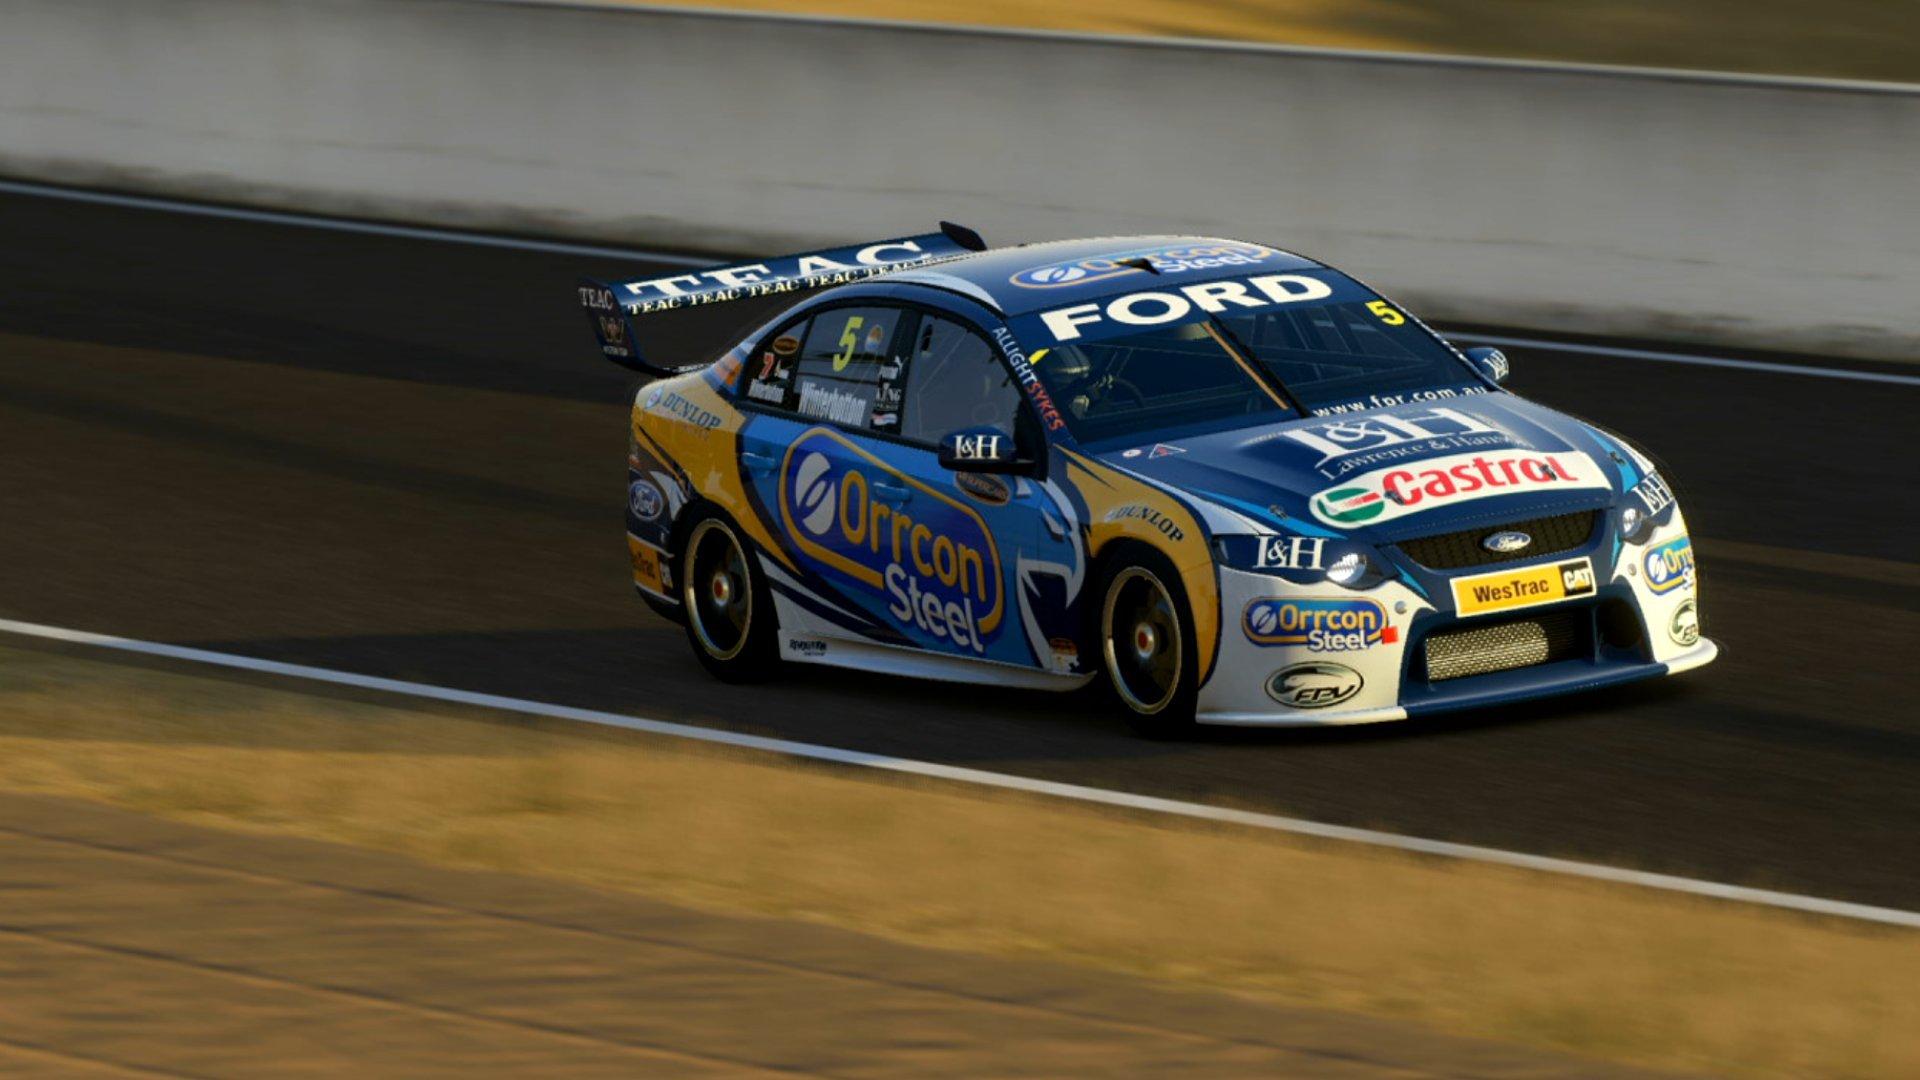 V8 at Bathurst Forza 5 Thrustmaster TX Racing Wheel